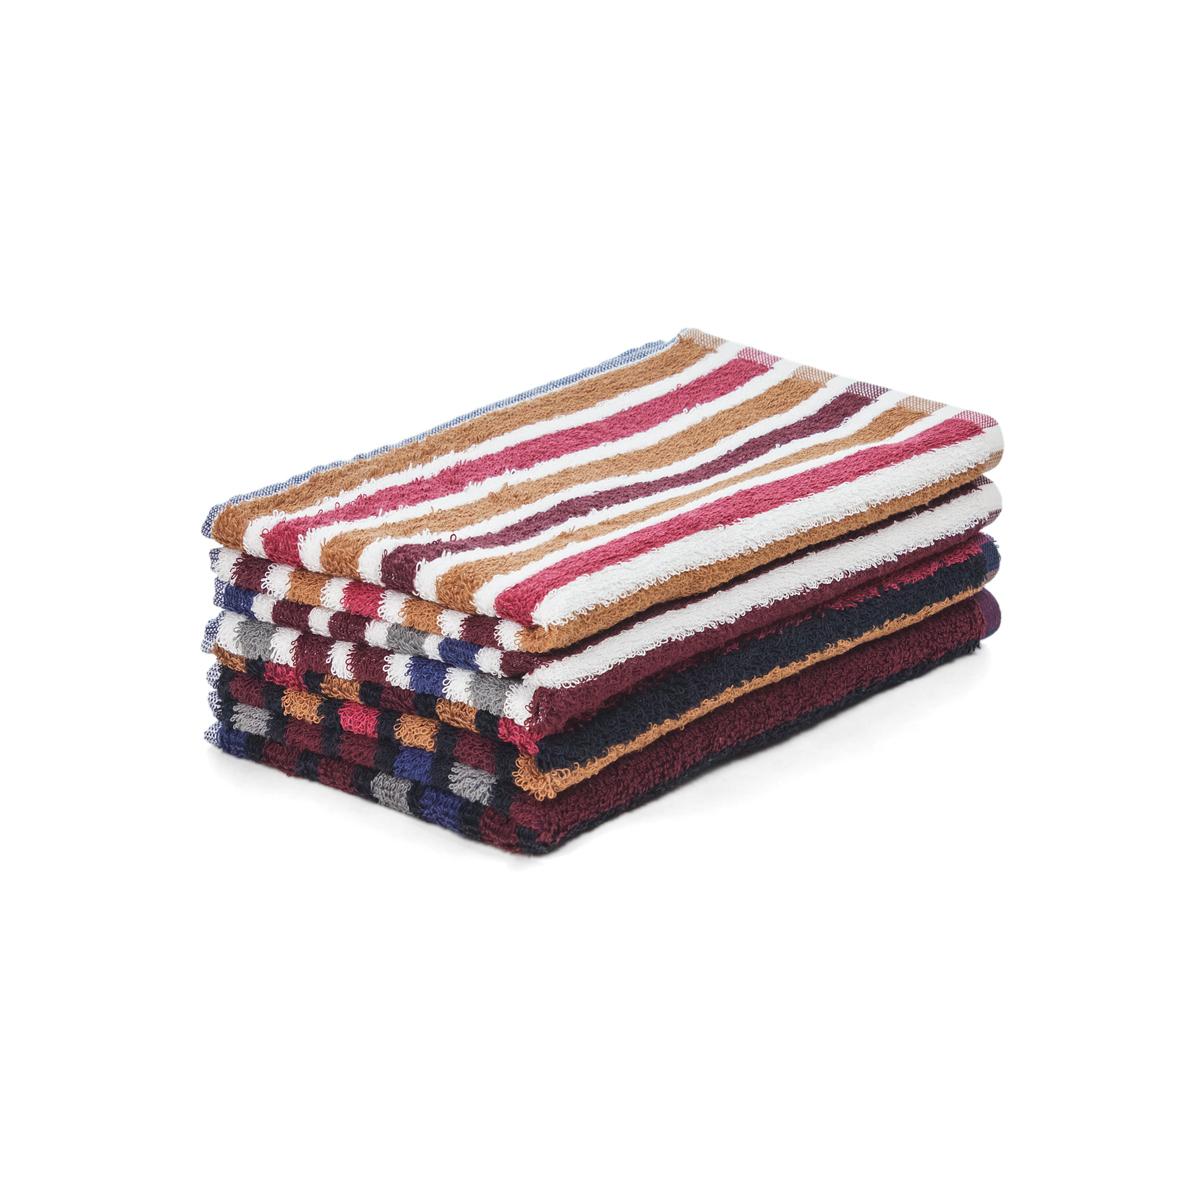 Полотенце Полосы Коричневый с белым р. 50х100Махровые полотенца<br><br><br>Тип: Полотенце<br>Размер: 50х100<br>Материал: Махра